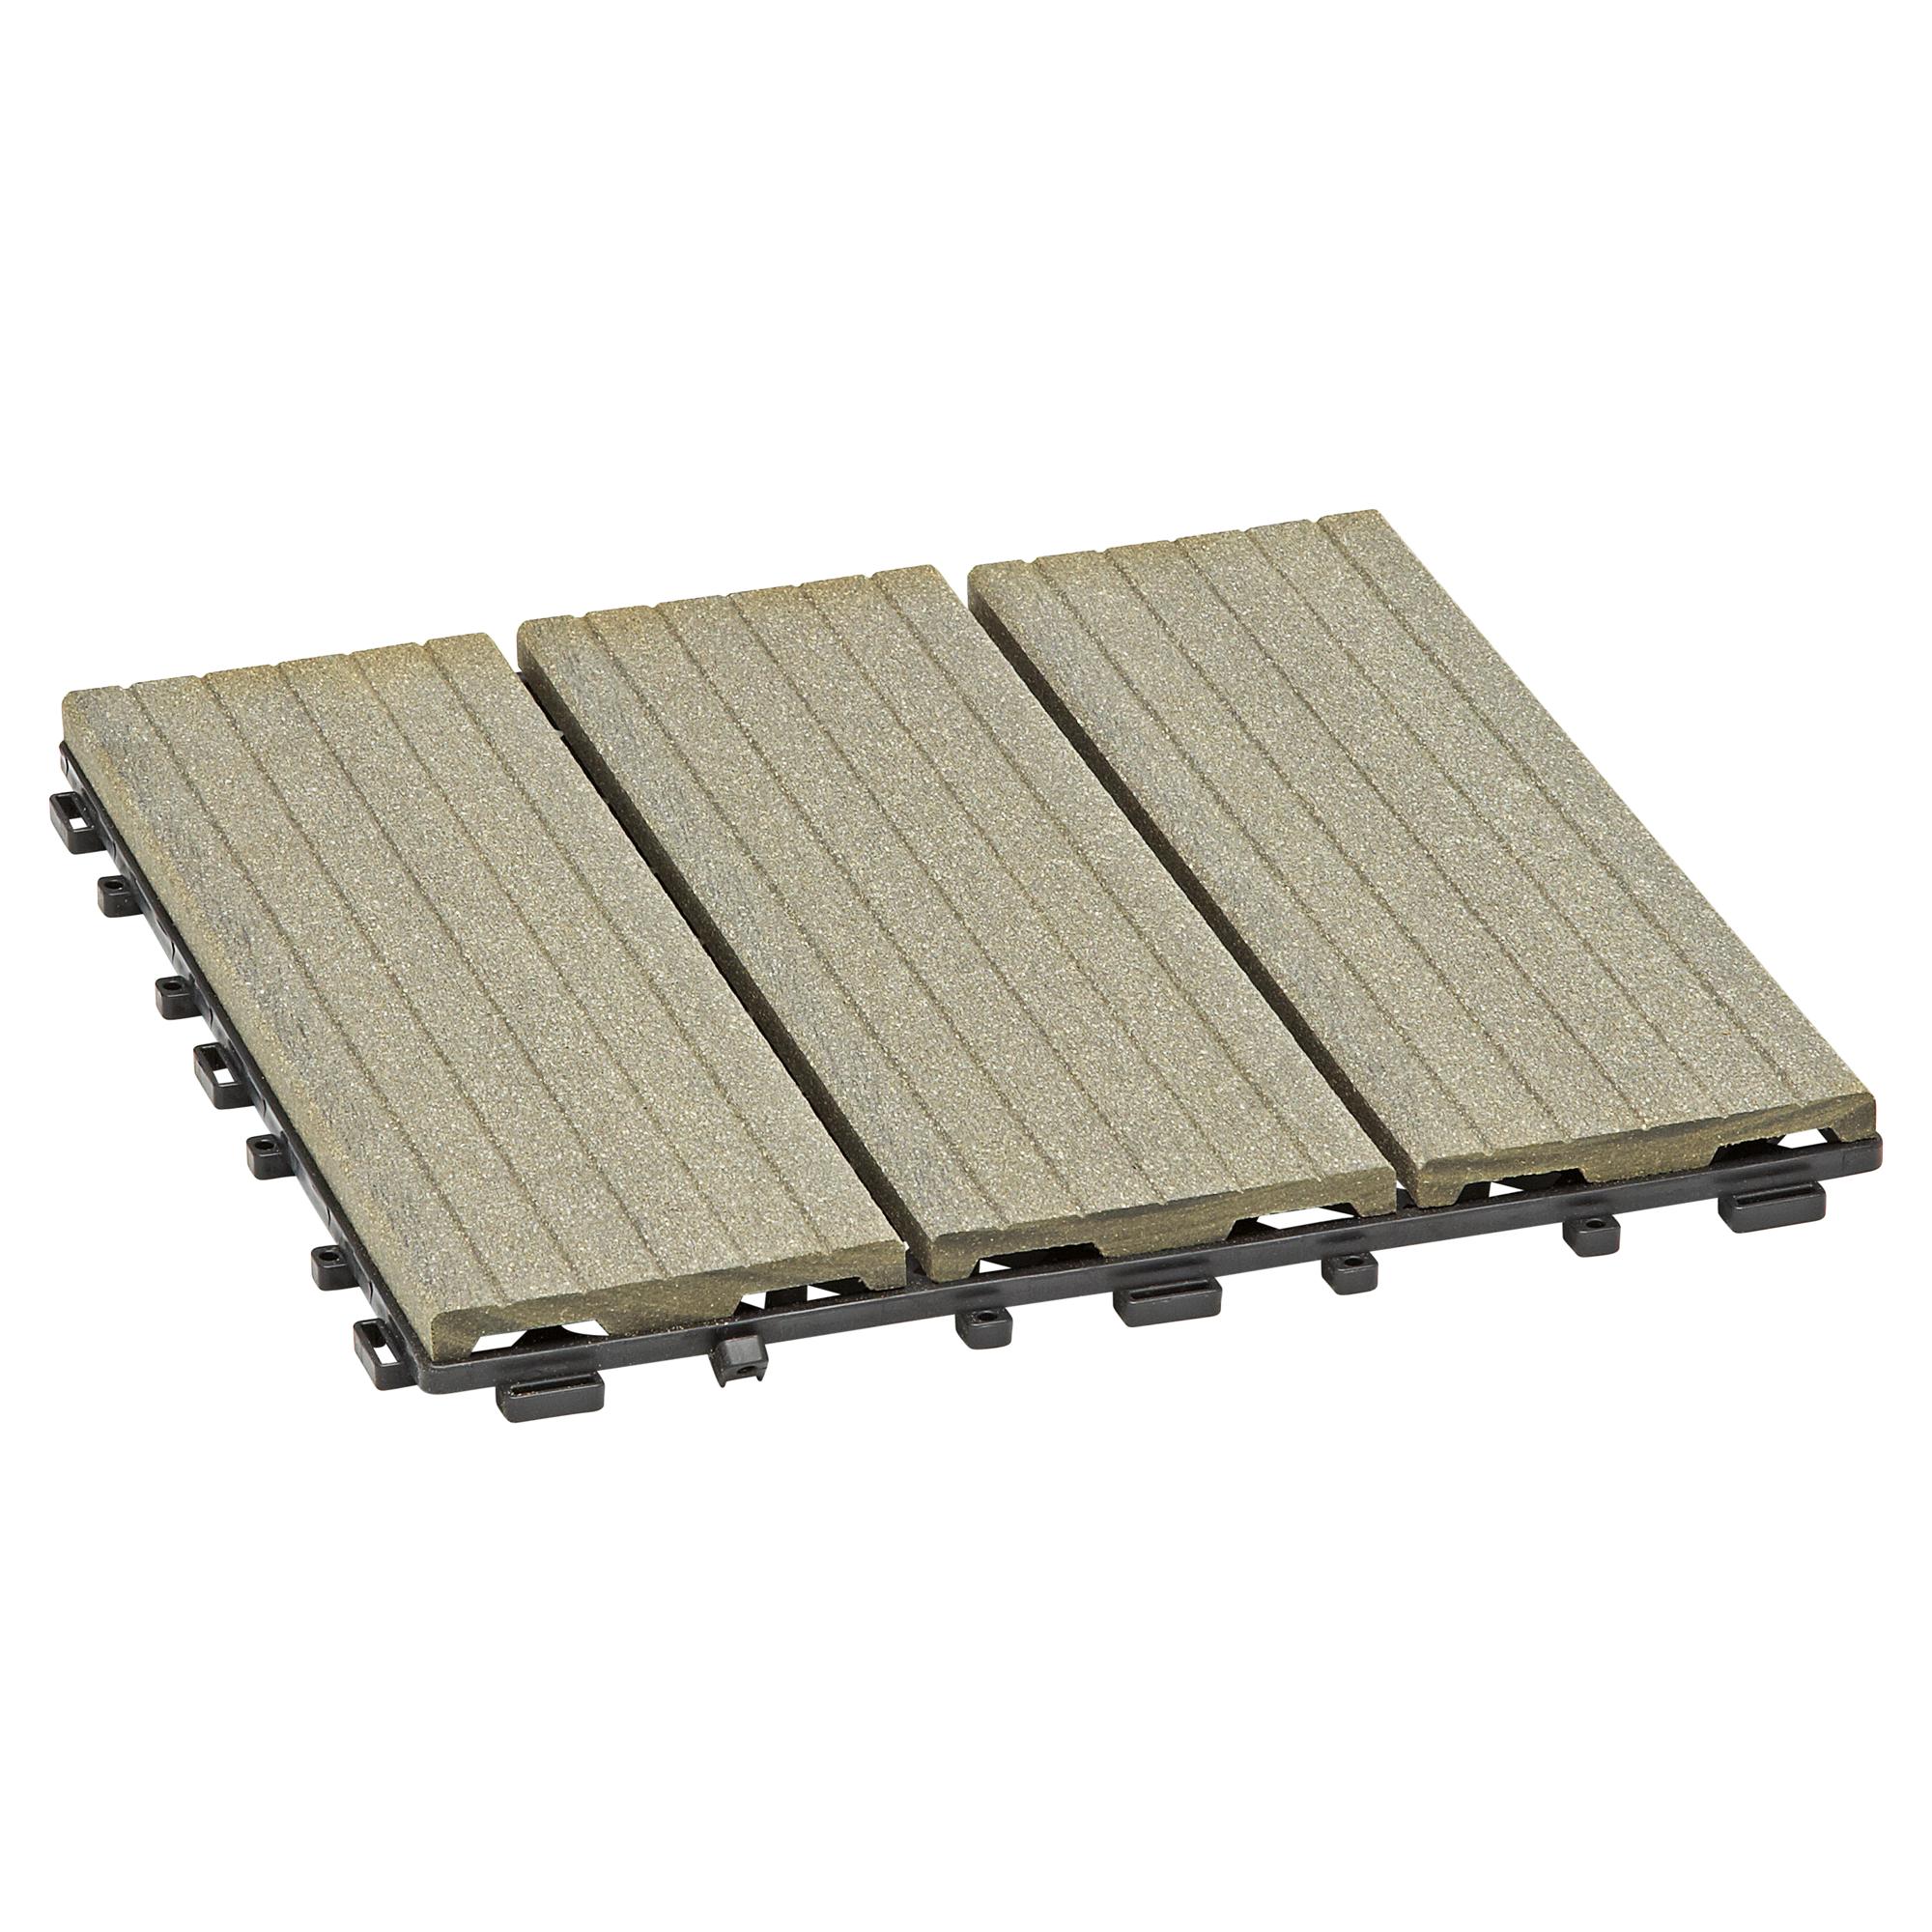 Rettenmeier Outdoor Wood Klickfliese grau 4 Stück ǀ toom